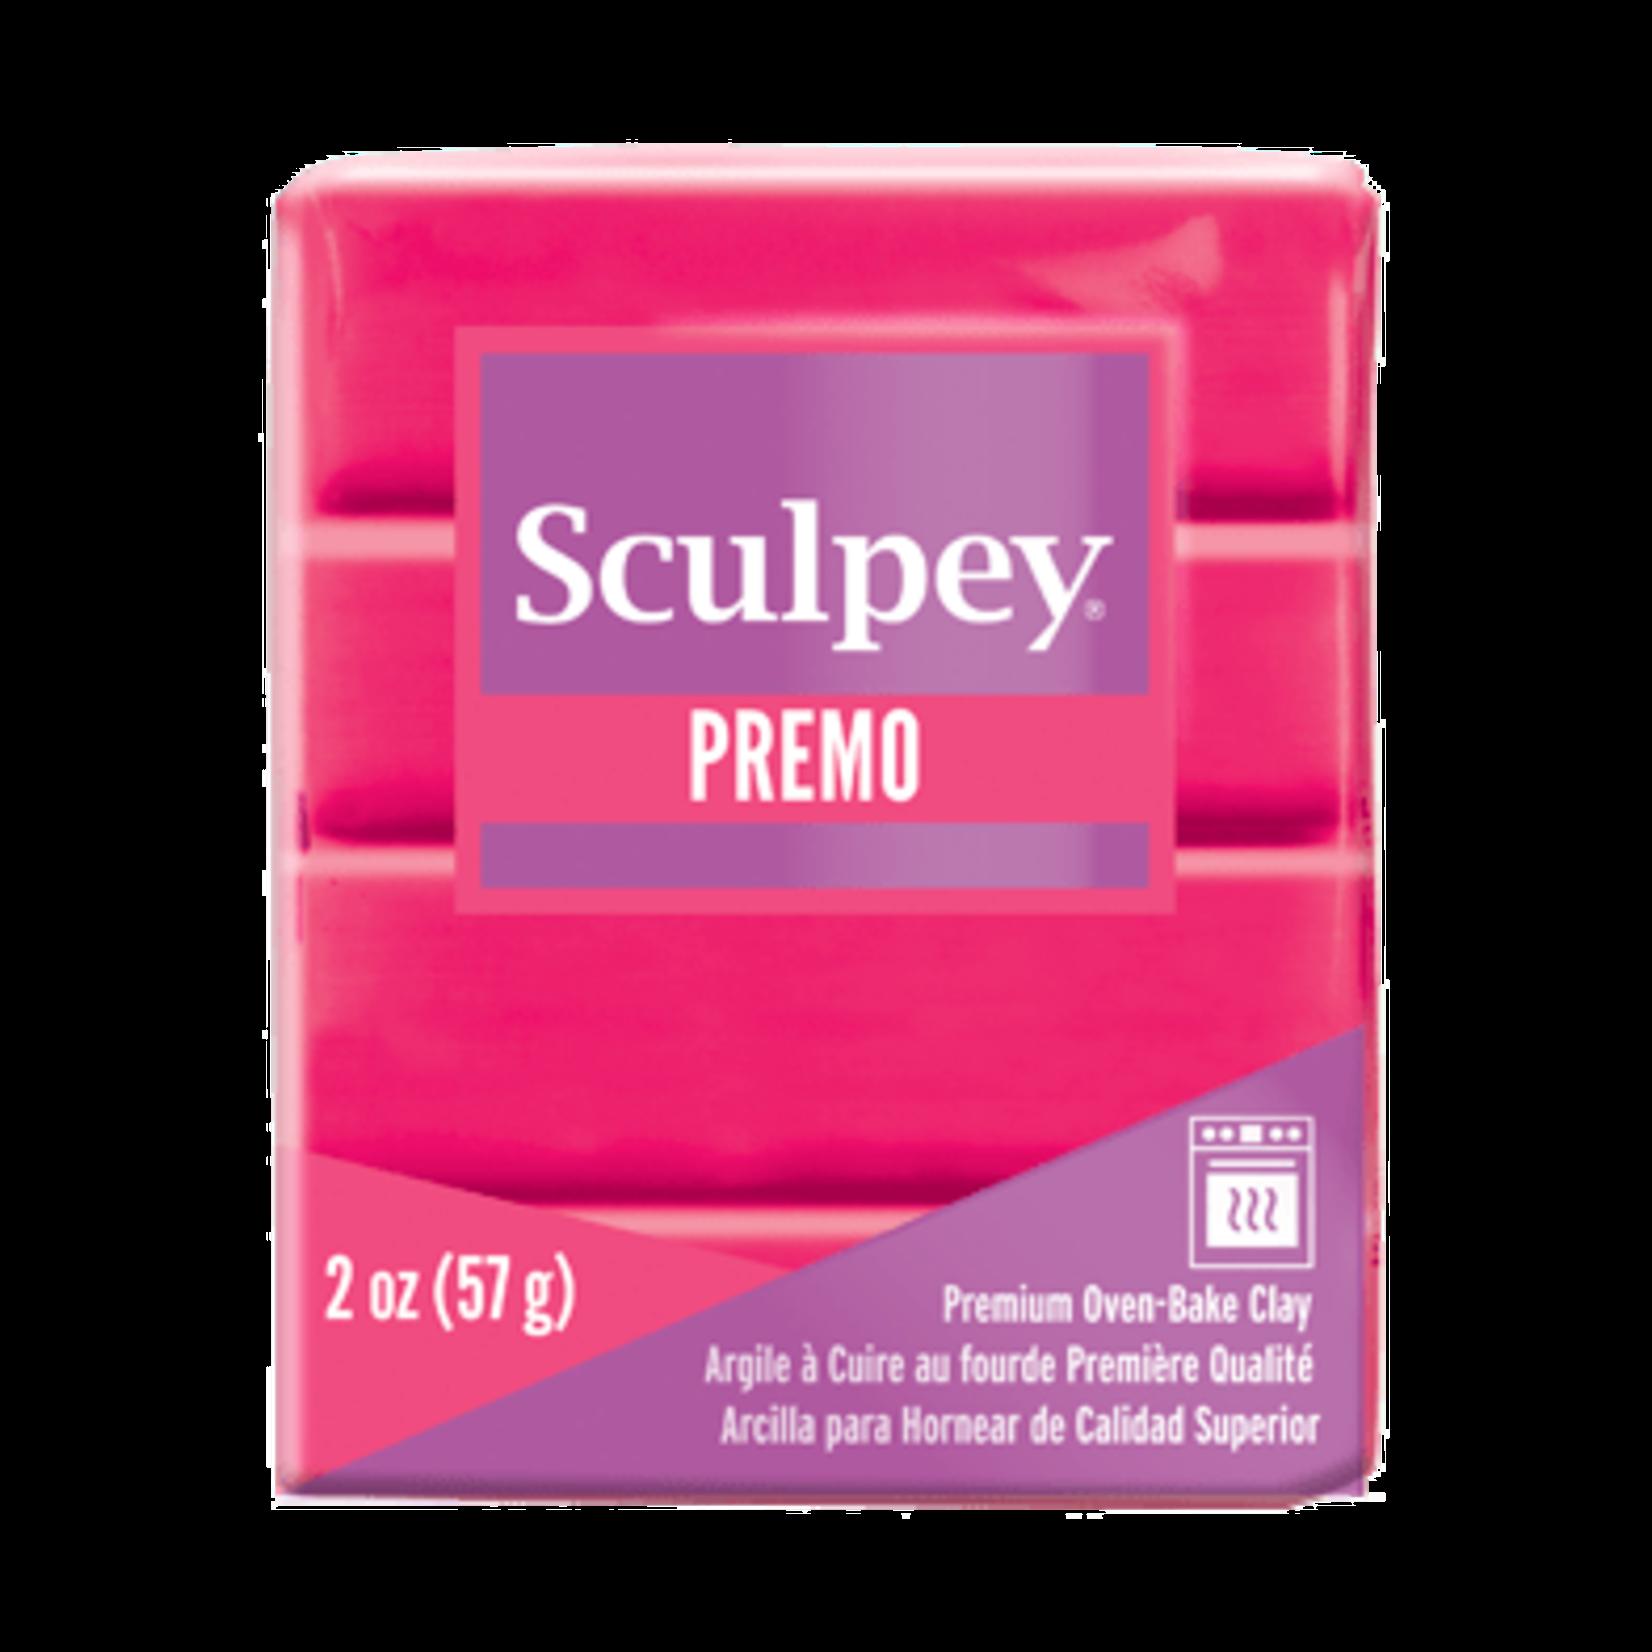 Sculpey Sculpey Premo  -- Flourescent Pink